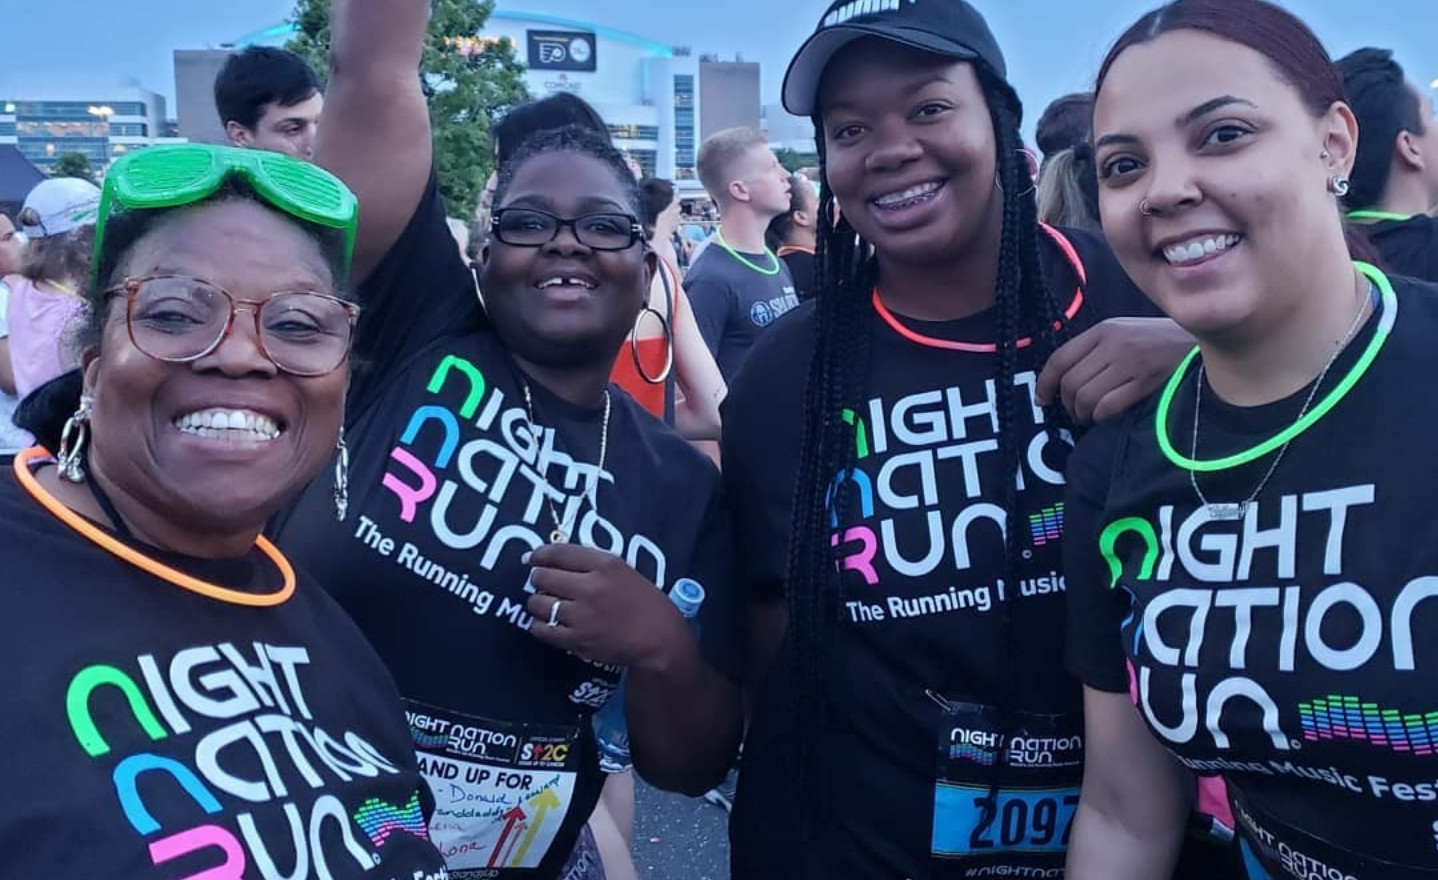 Night Nation Run with Members in June 2019 in Philadelphia